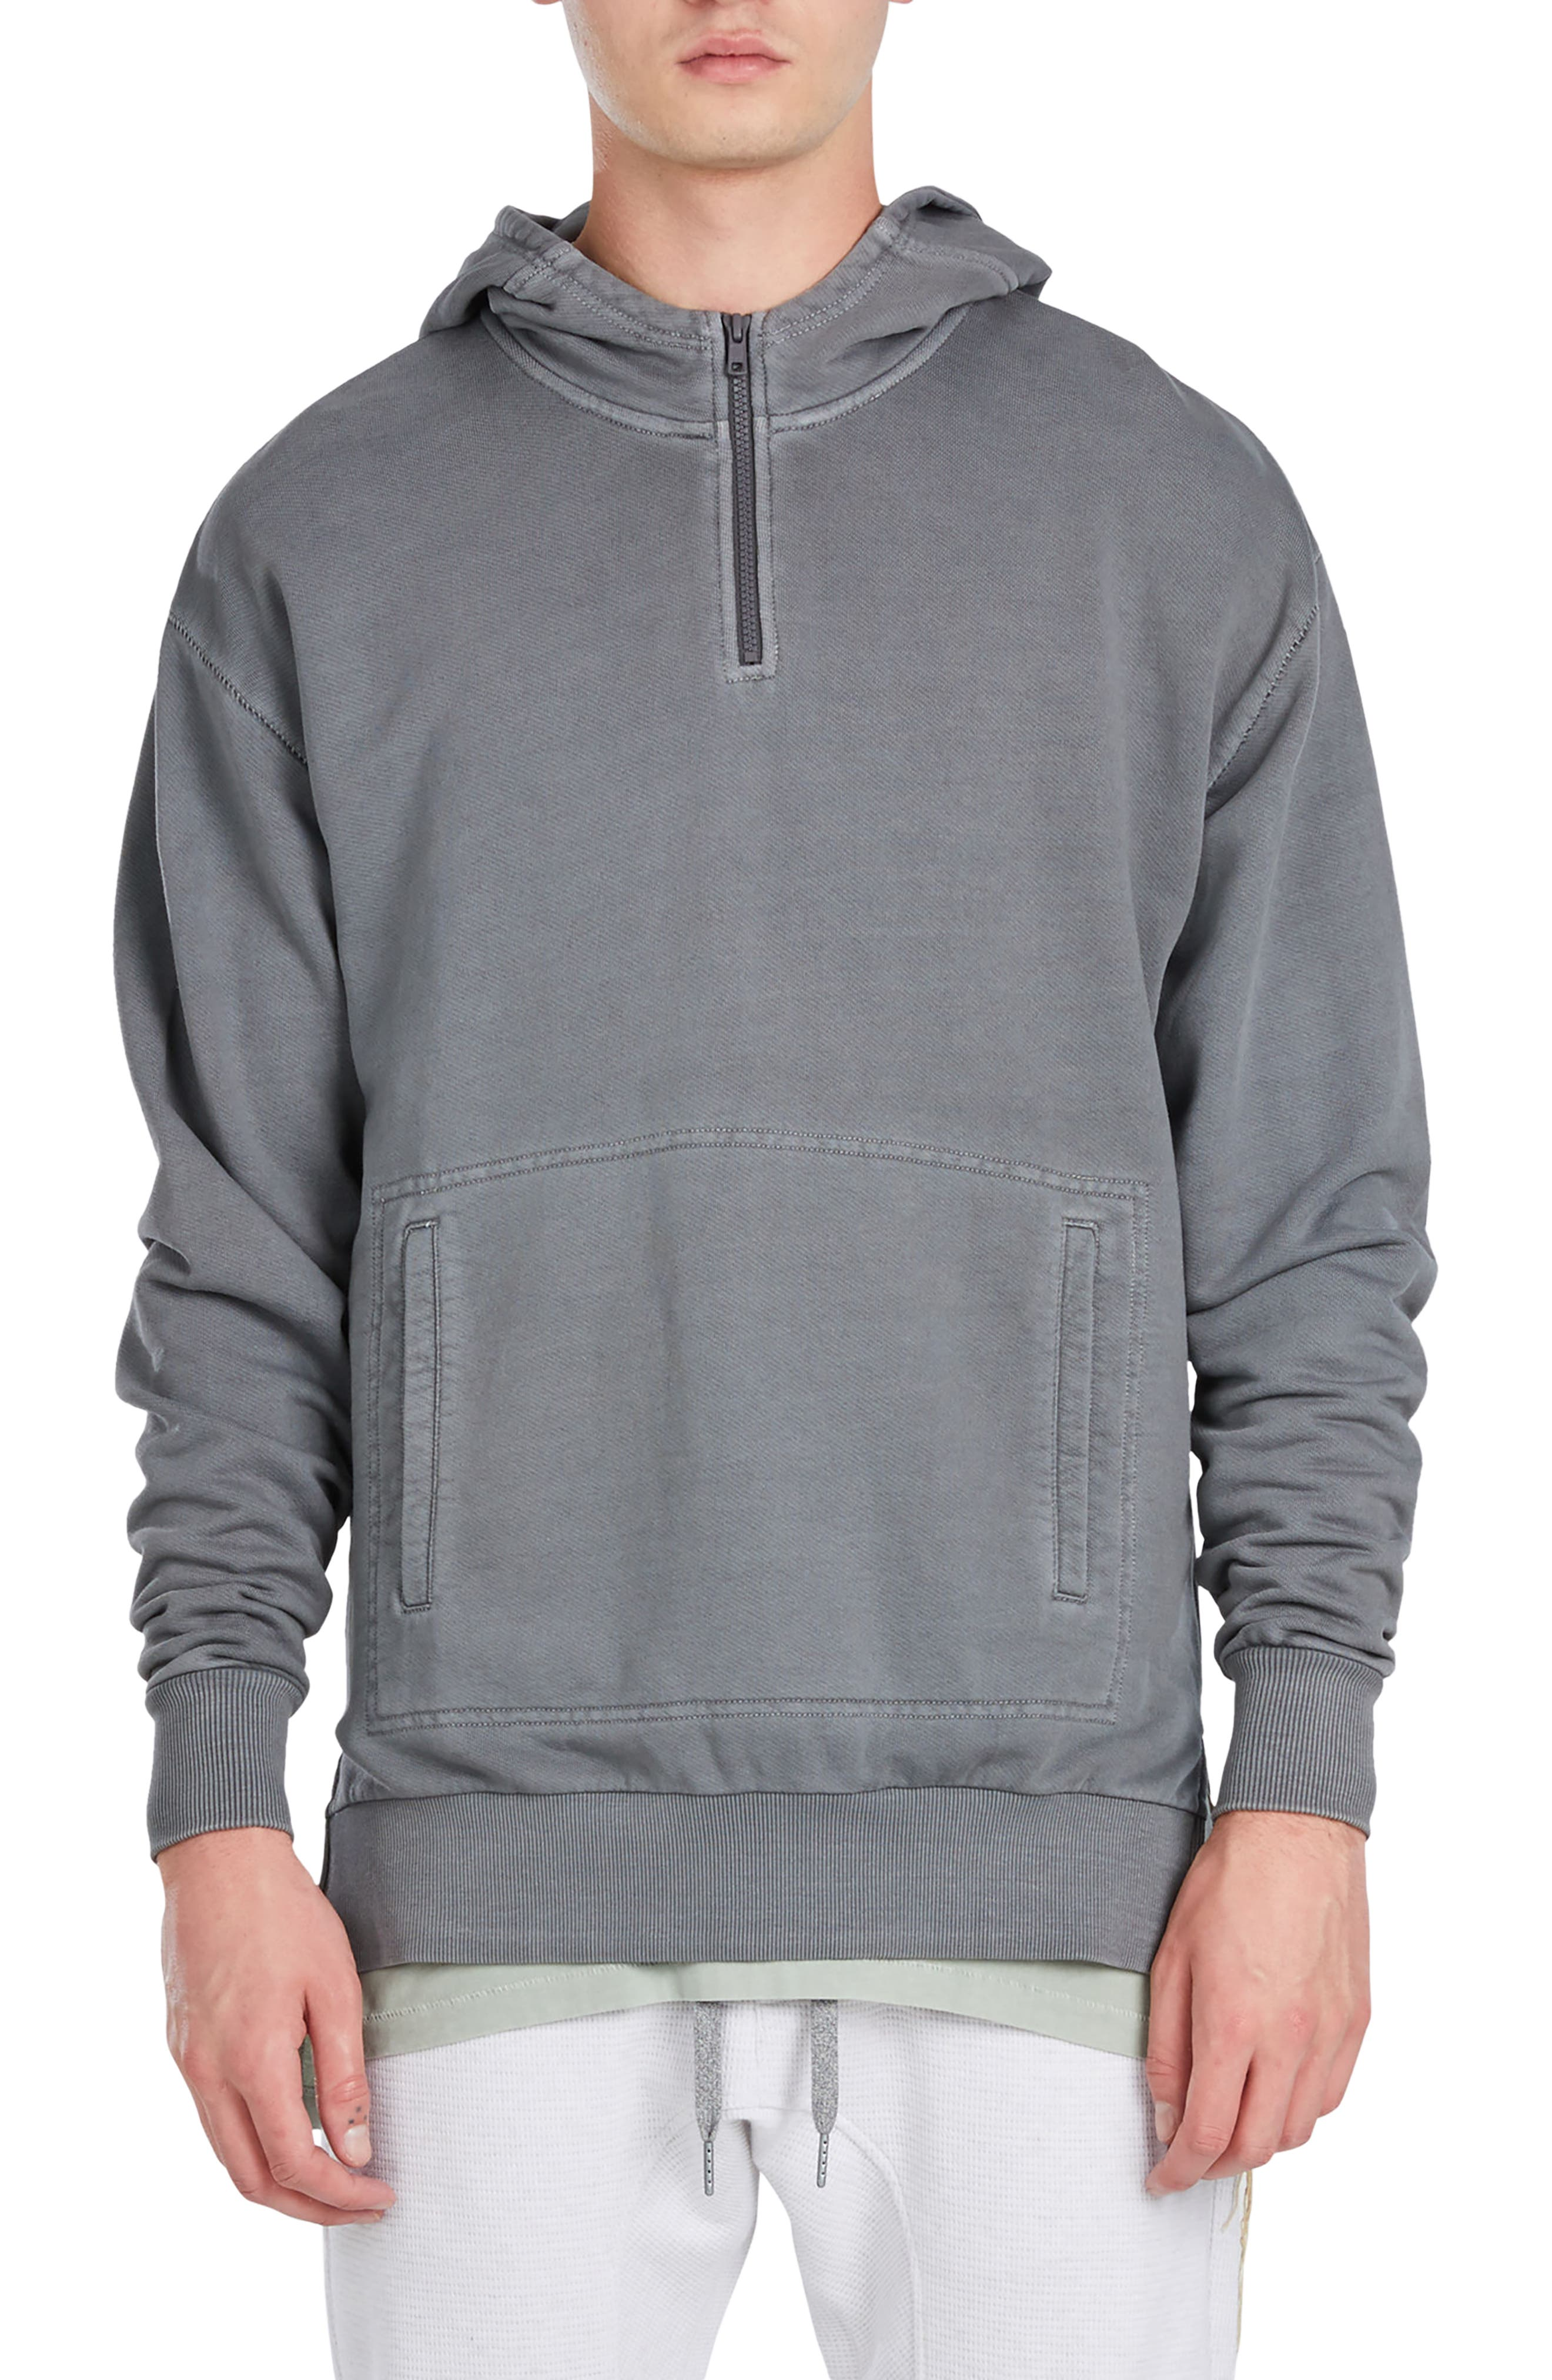 Rugger Quarter Zip Hoodie,                         Main,                         color, Pigment Grey